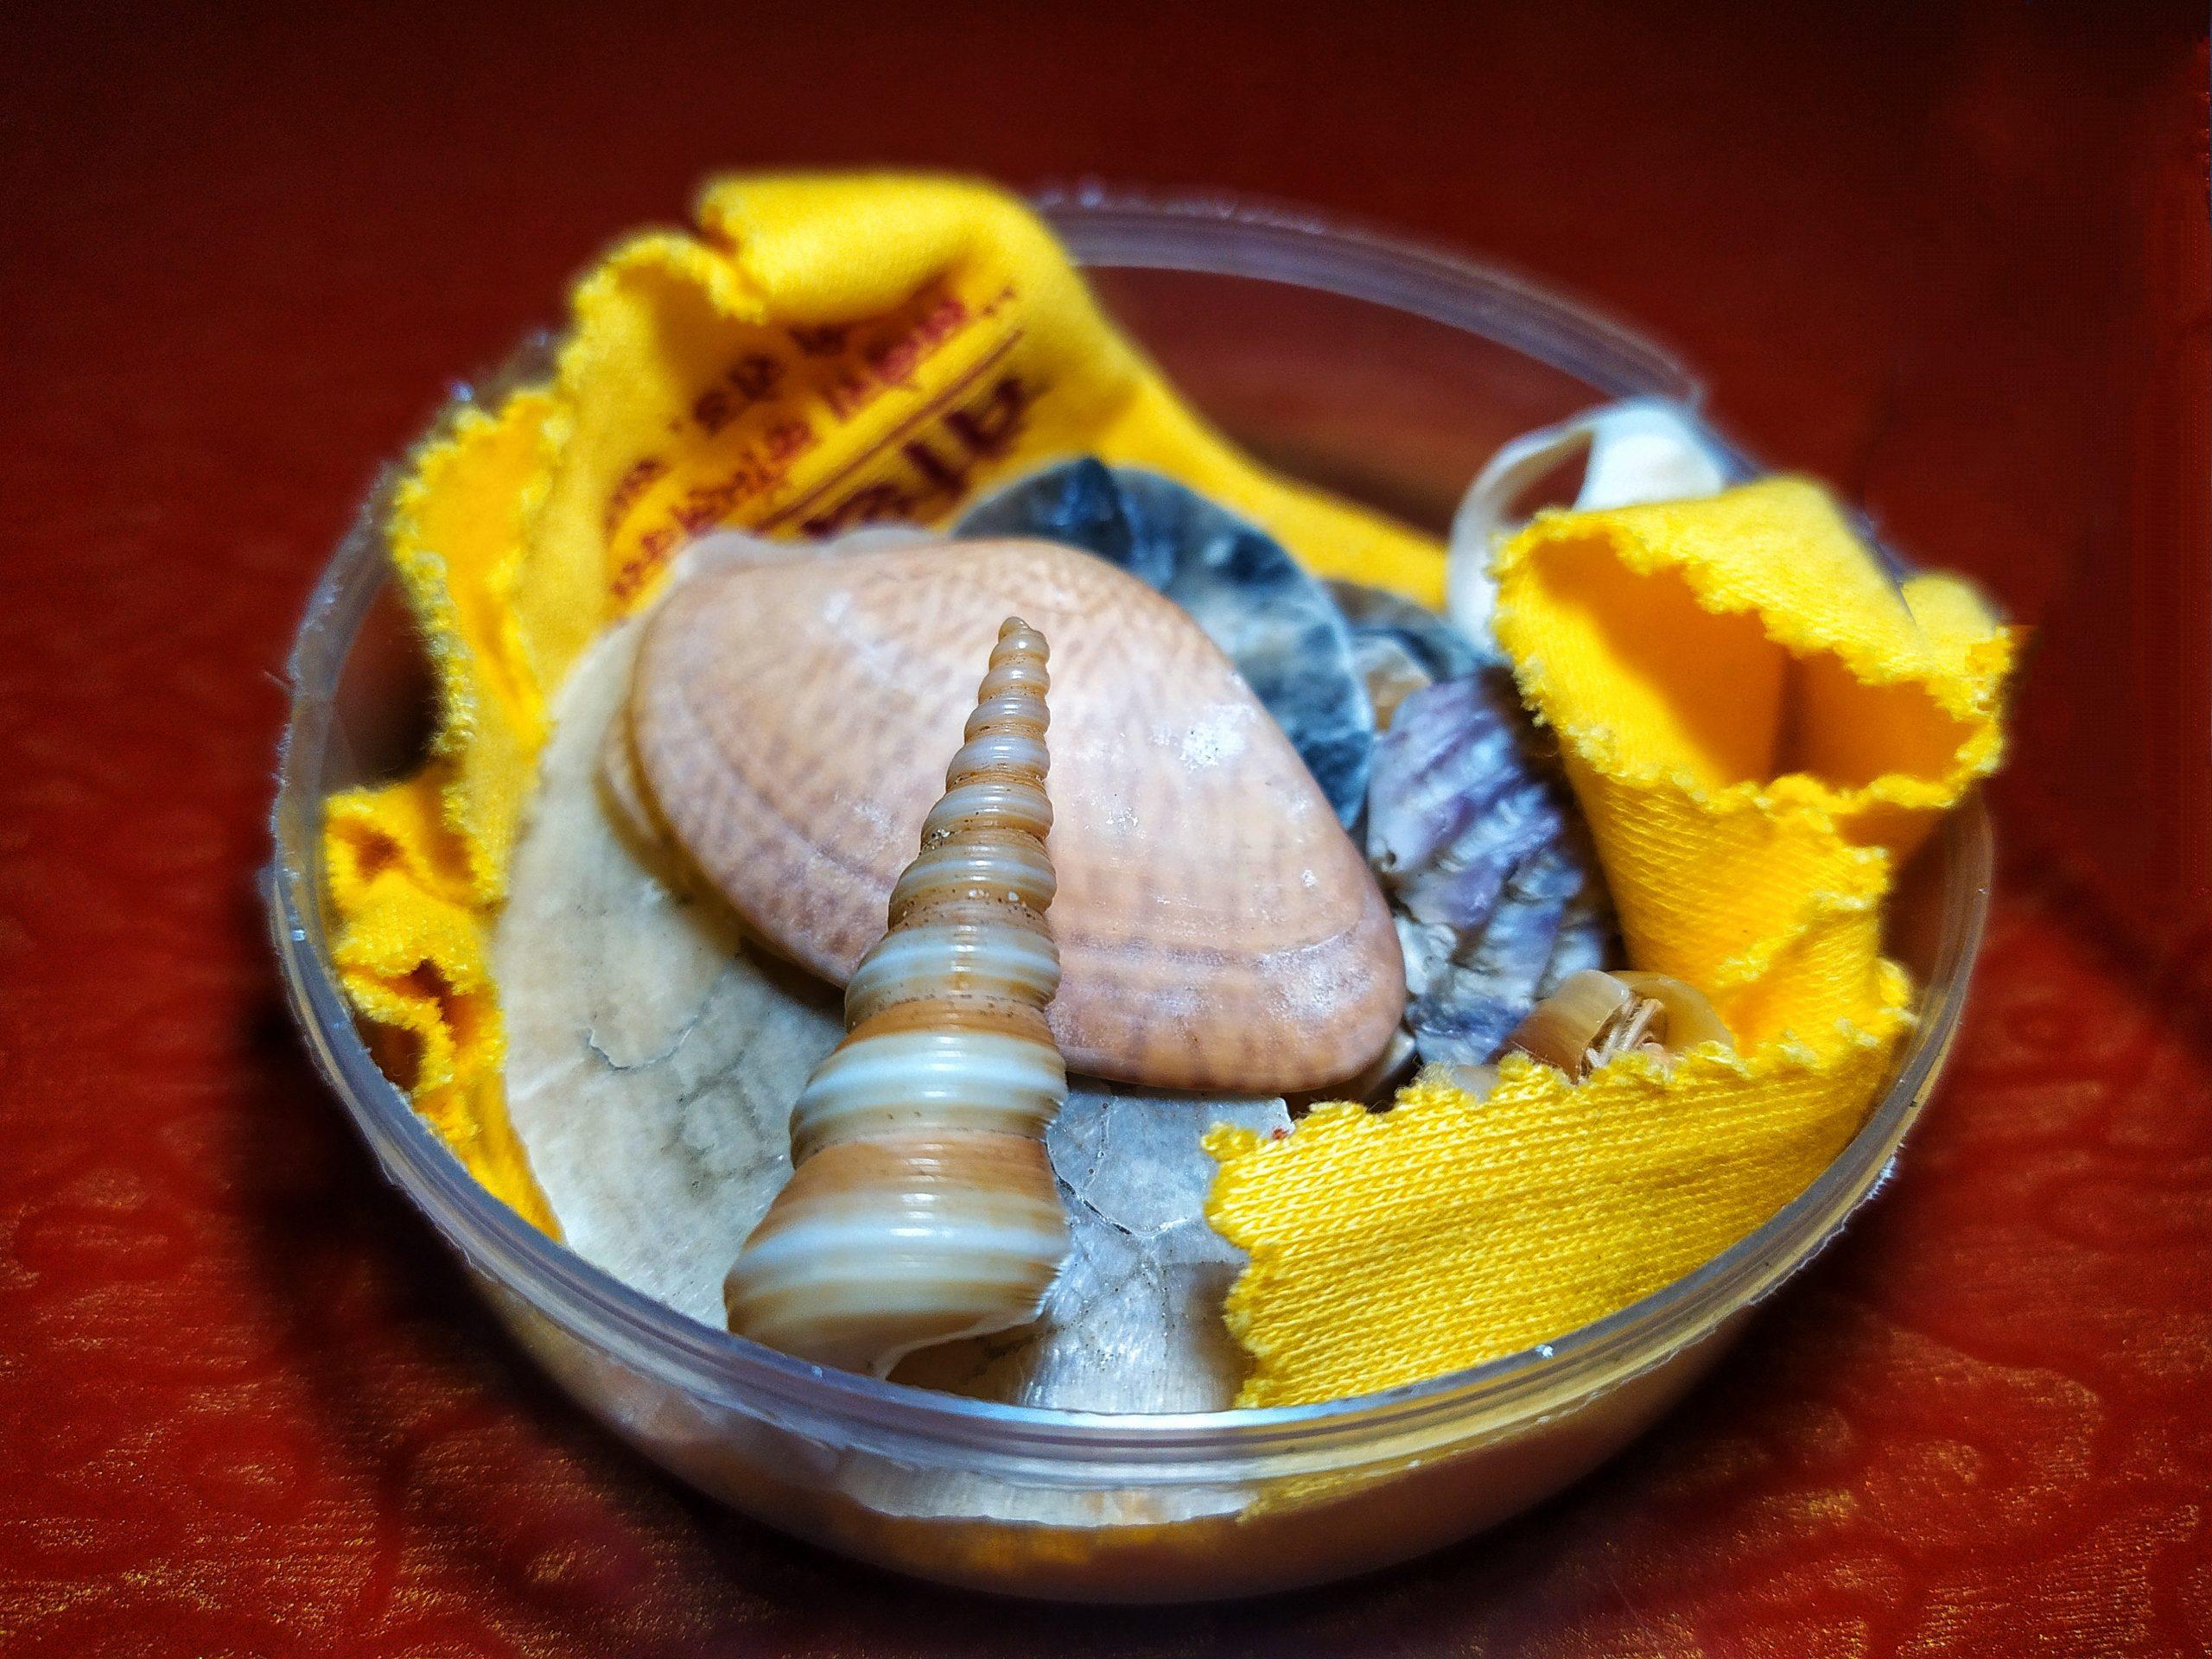 seashells in a bowl